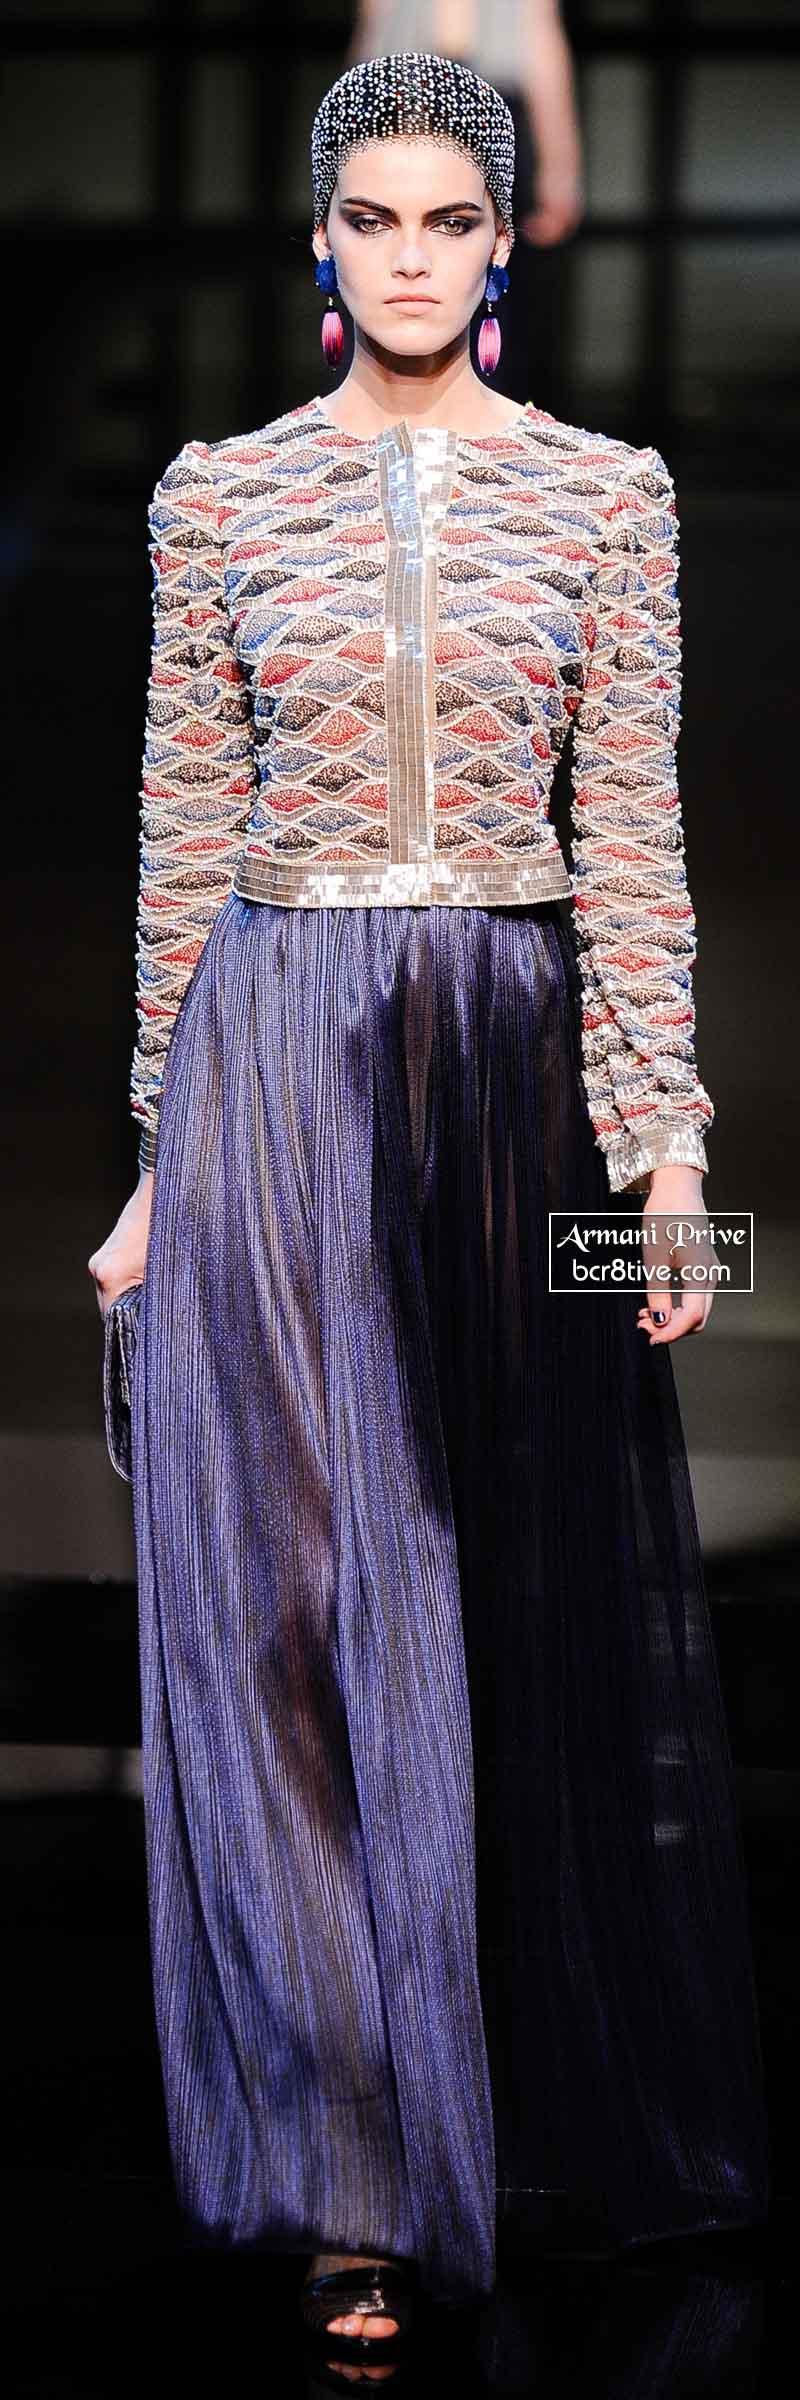 Armani Privé Spring 2014 Couture